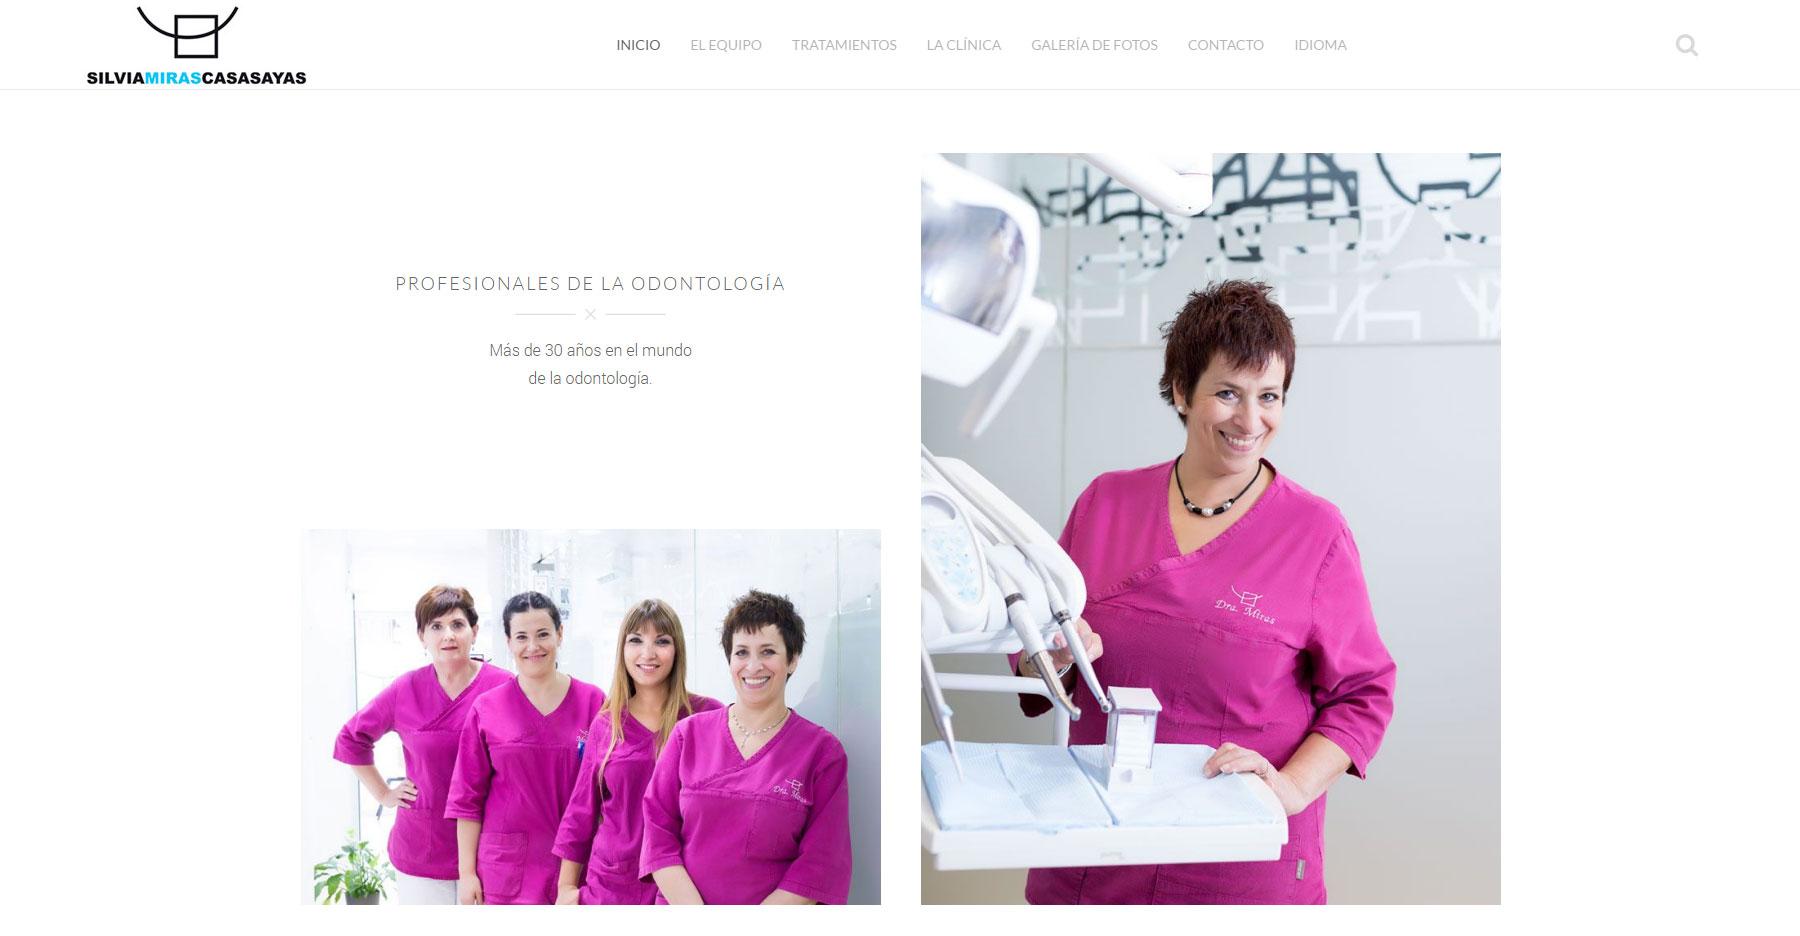 Dental Clinic Silvia M. Casasayas - Website of the Day